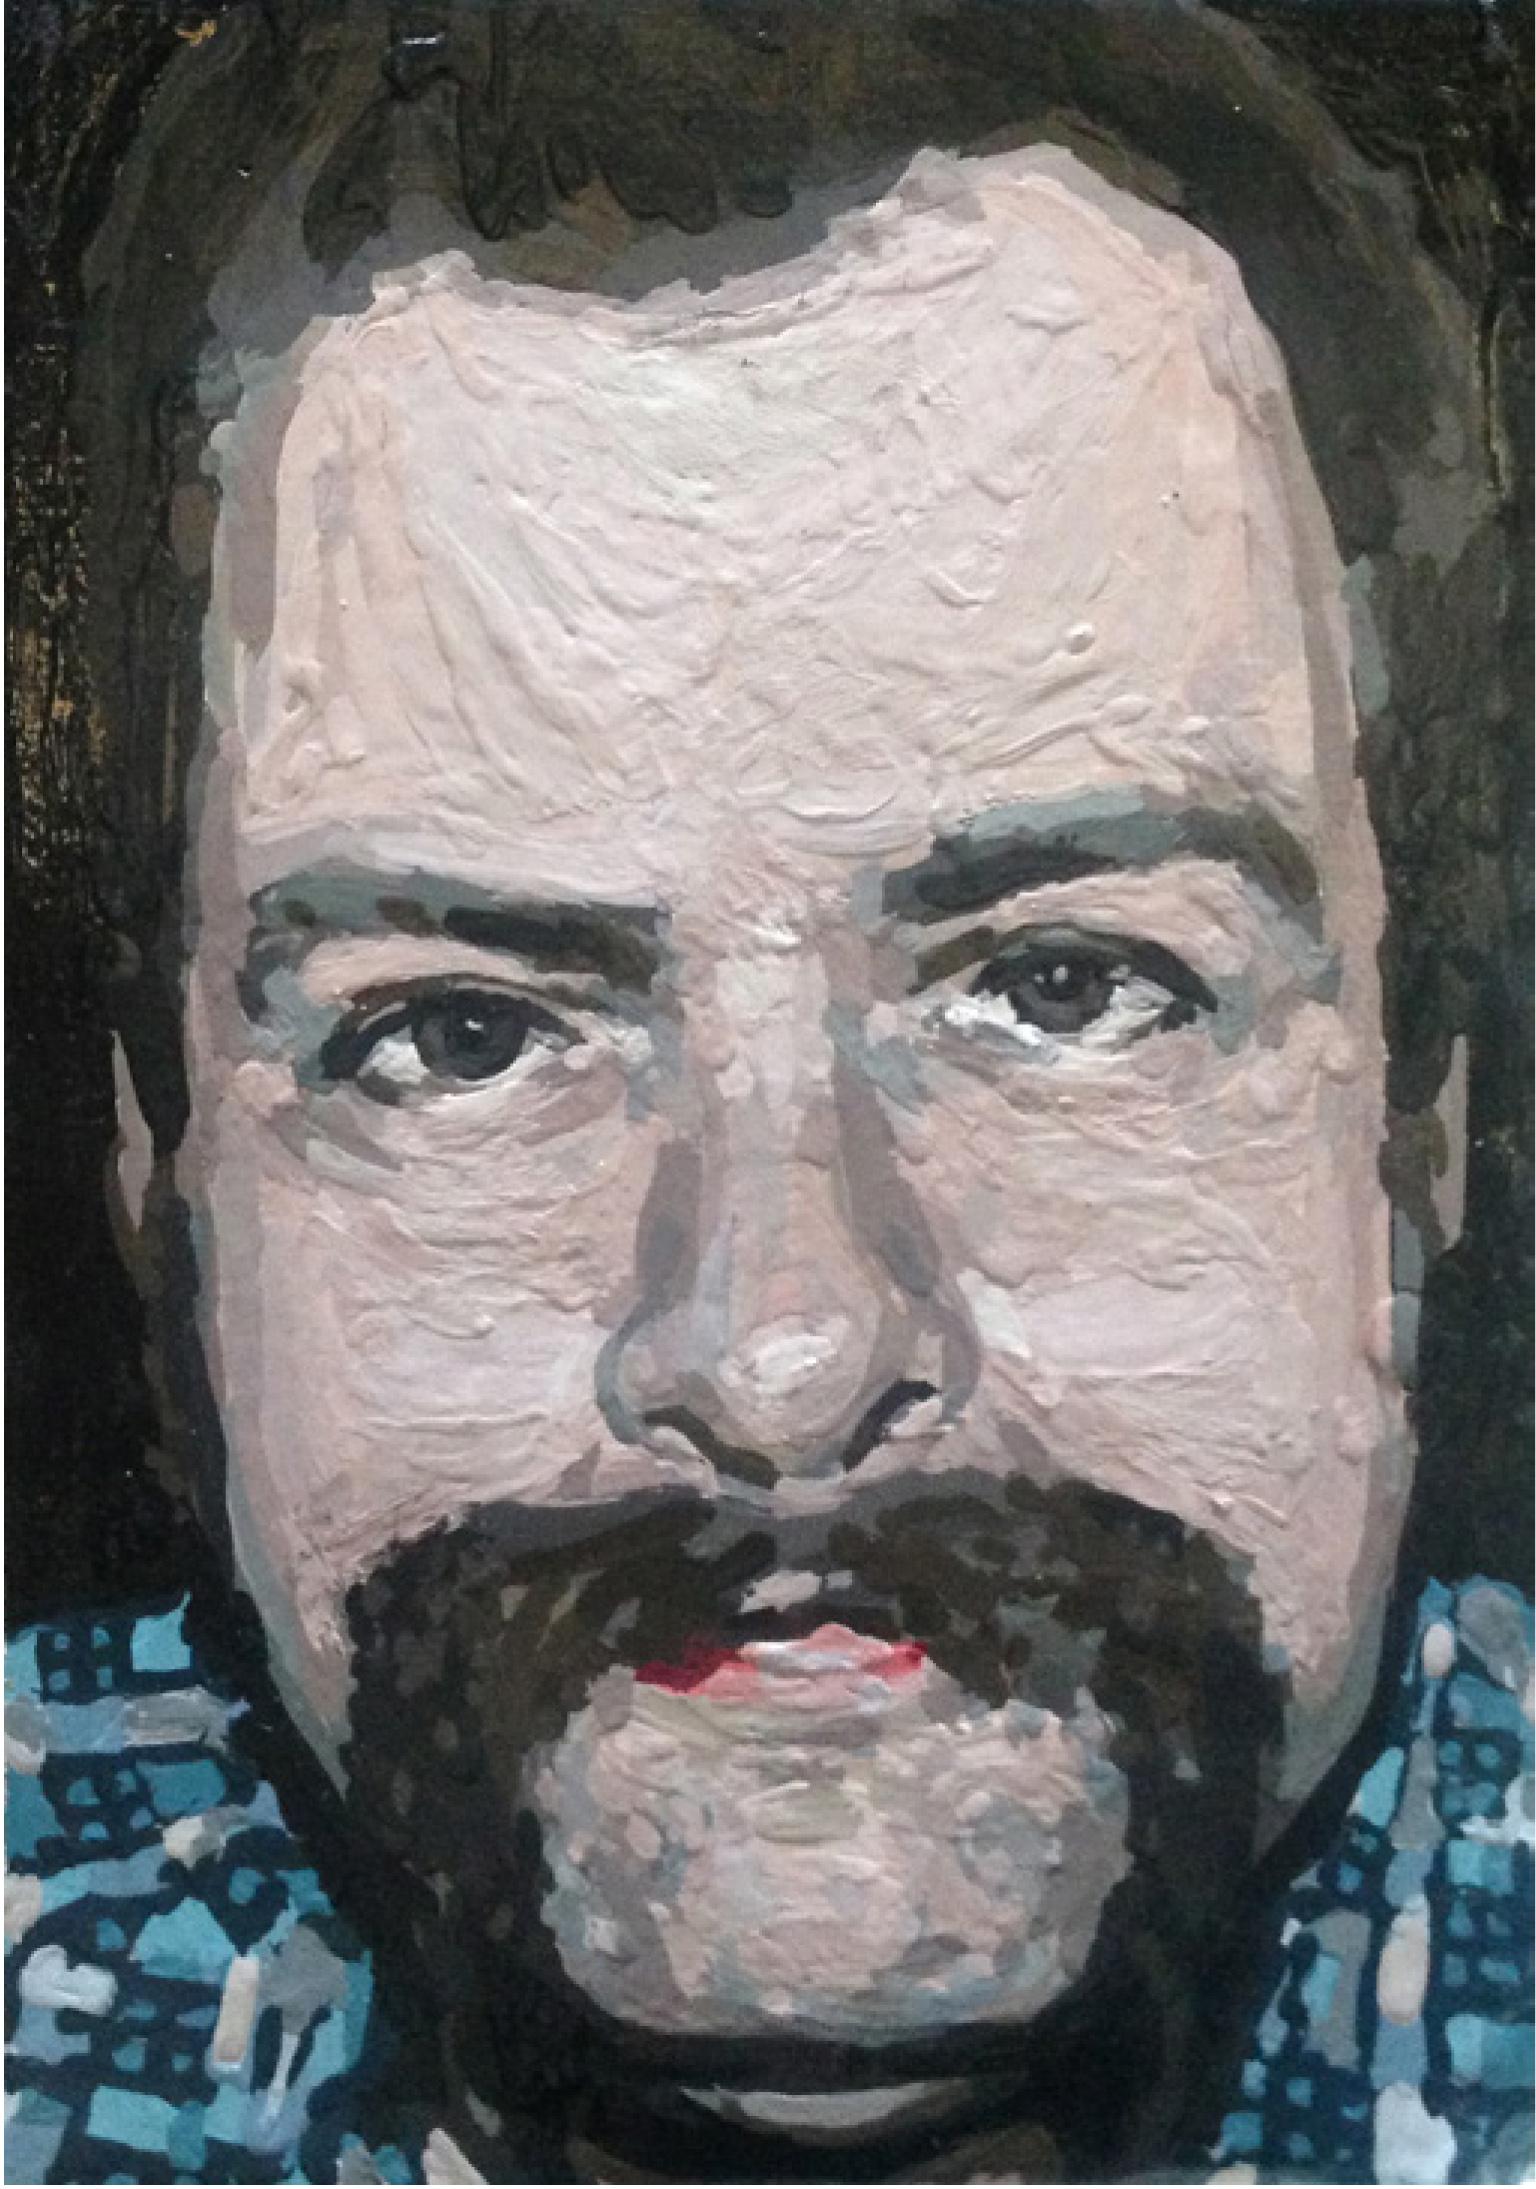 16 | Nadine Wölk | Mustache VI | 2012 | Acrcyl/Acryllack auf Leinwand | 18 x 12,5 cm | Kunstlotterie